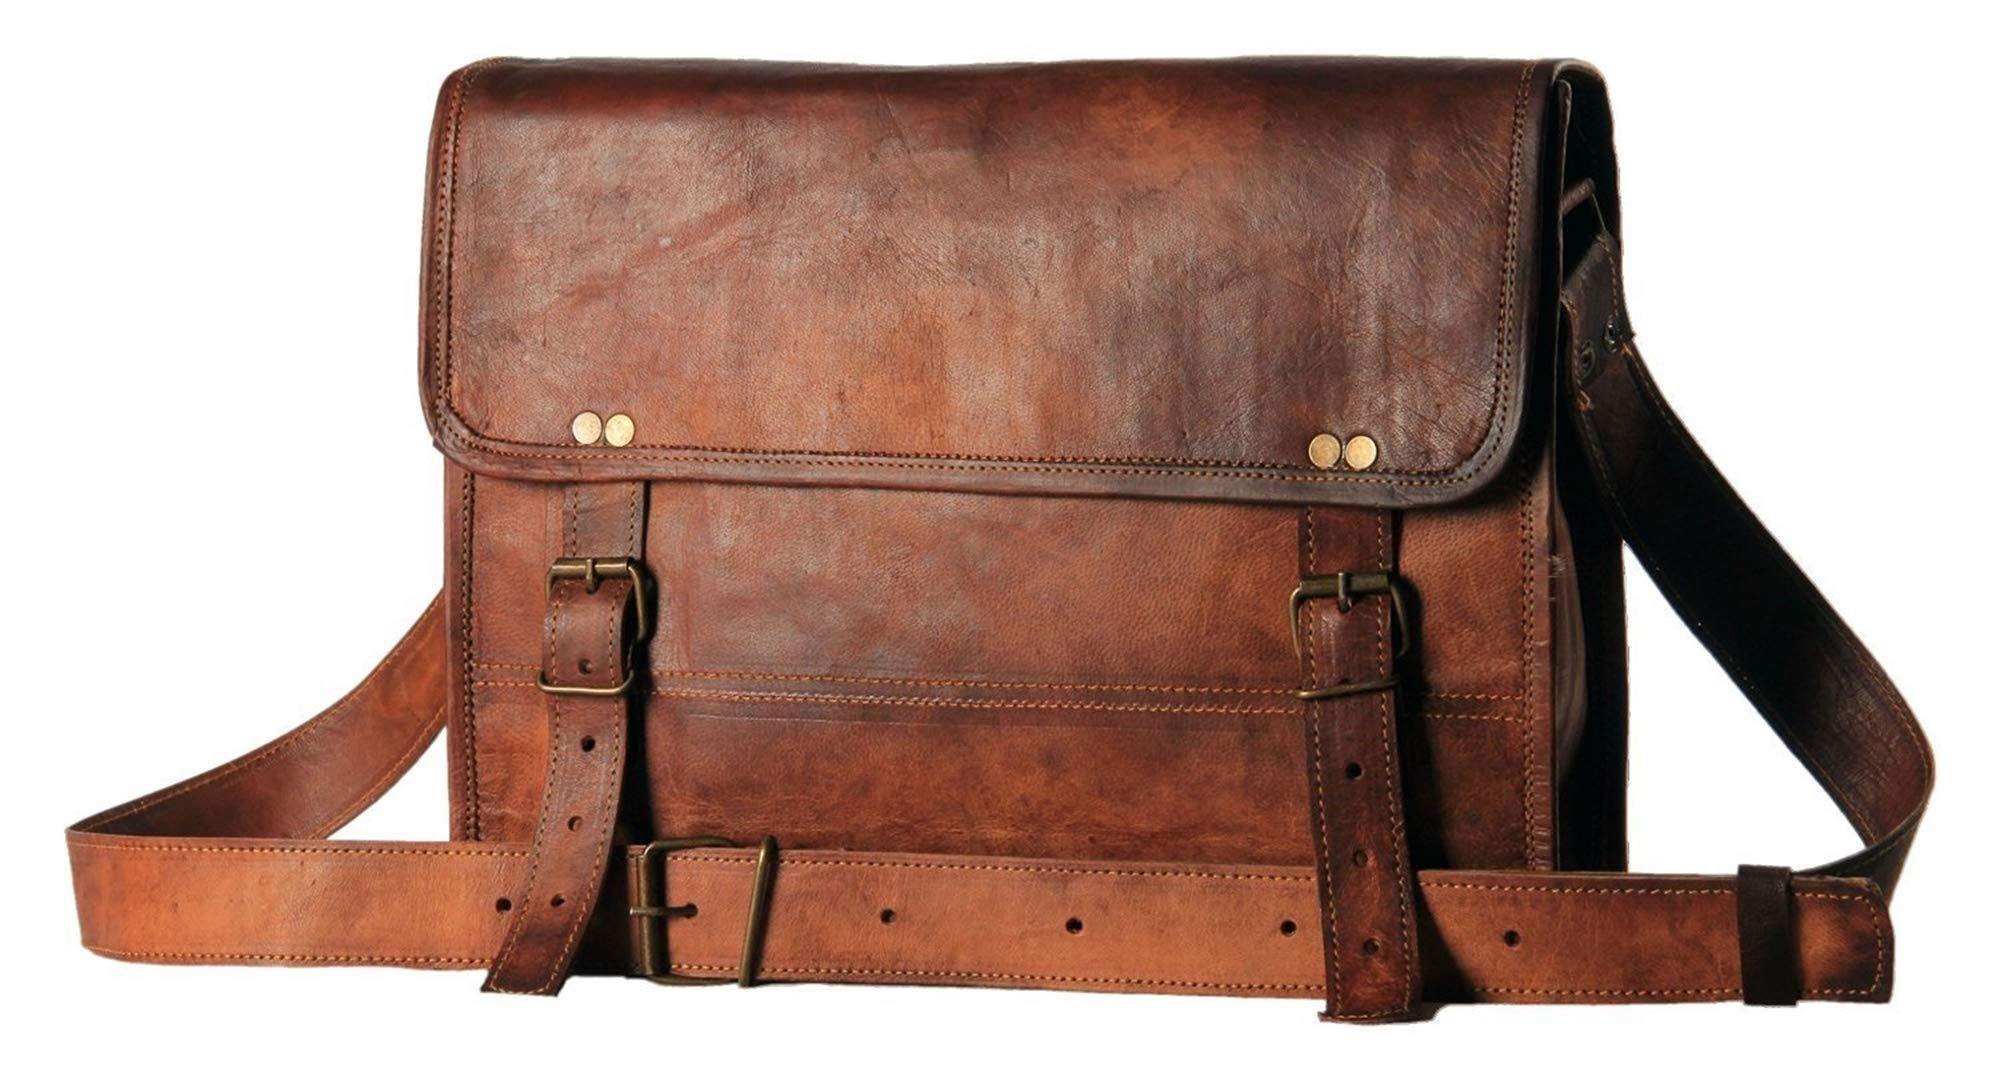 Distressed Brown Leather Messenger Bag Tablet Laptop Briefcase Crossbody Satchel